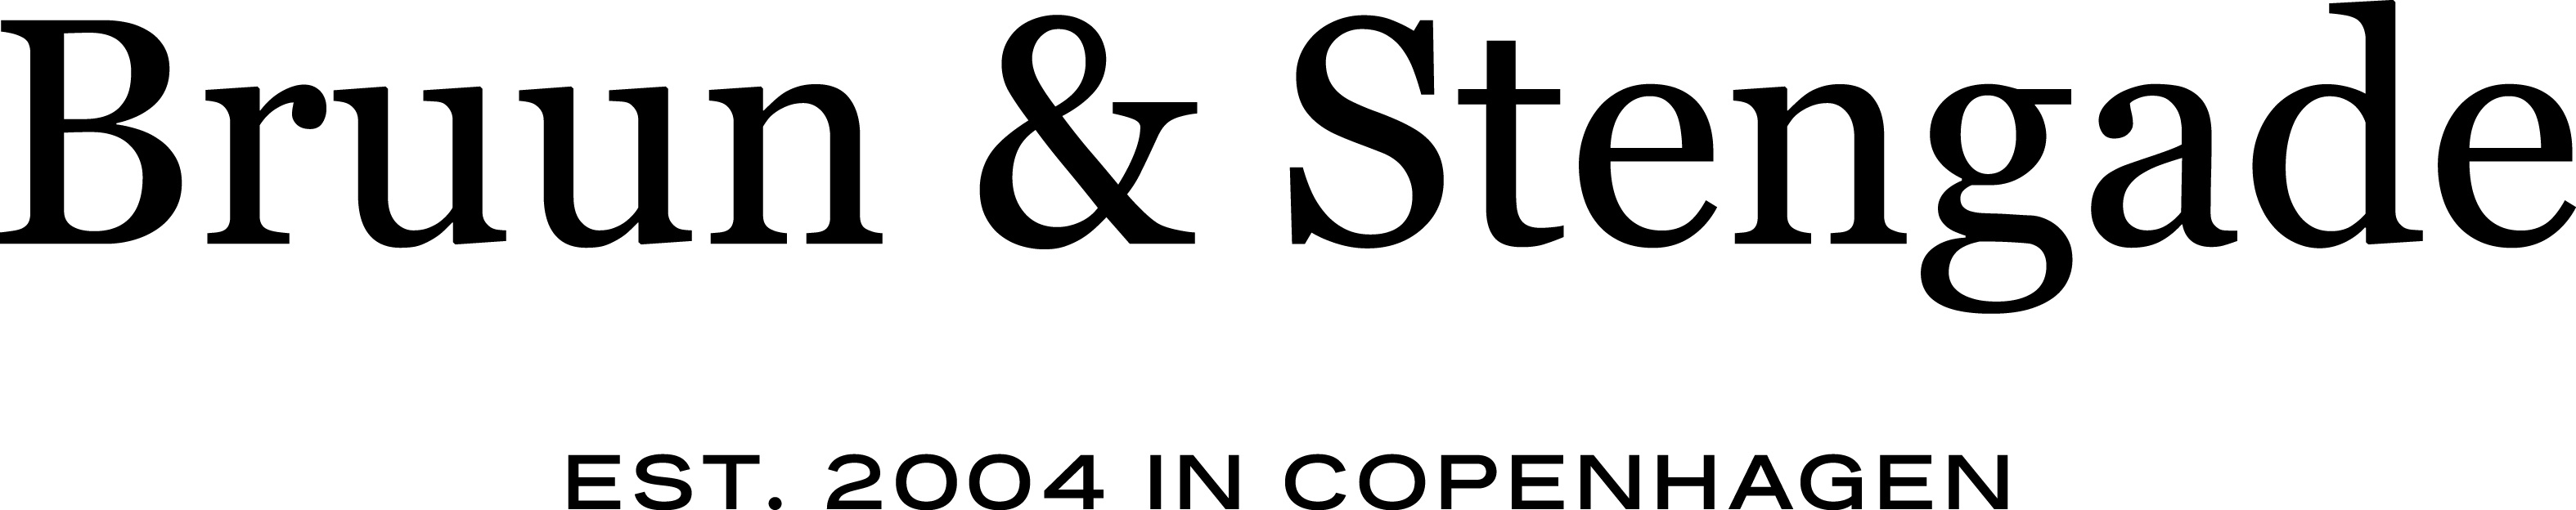 bruun_stengade_logo_payoff